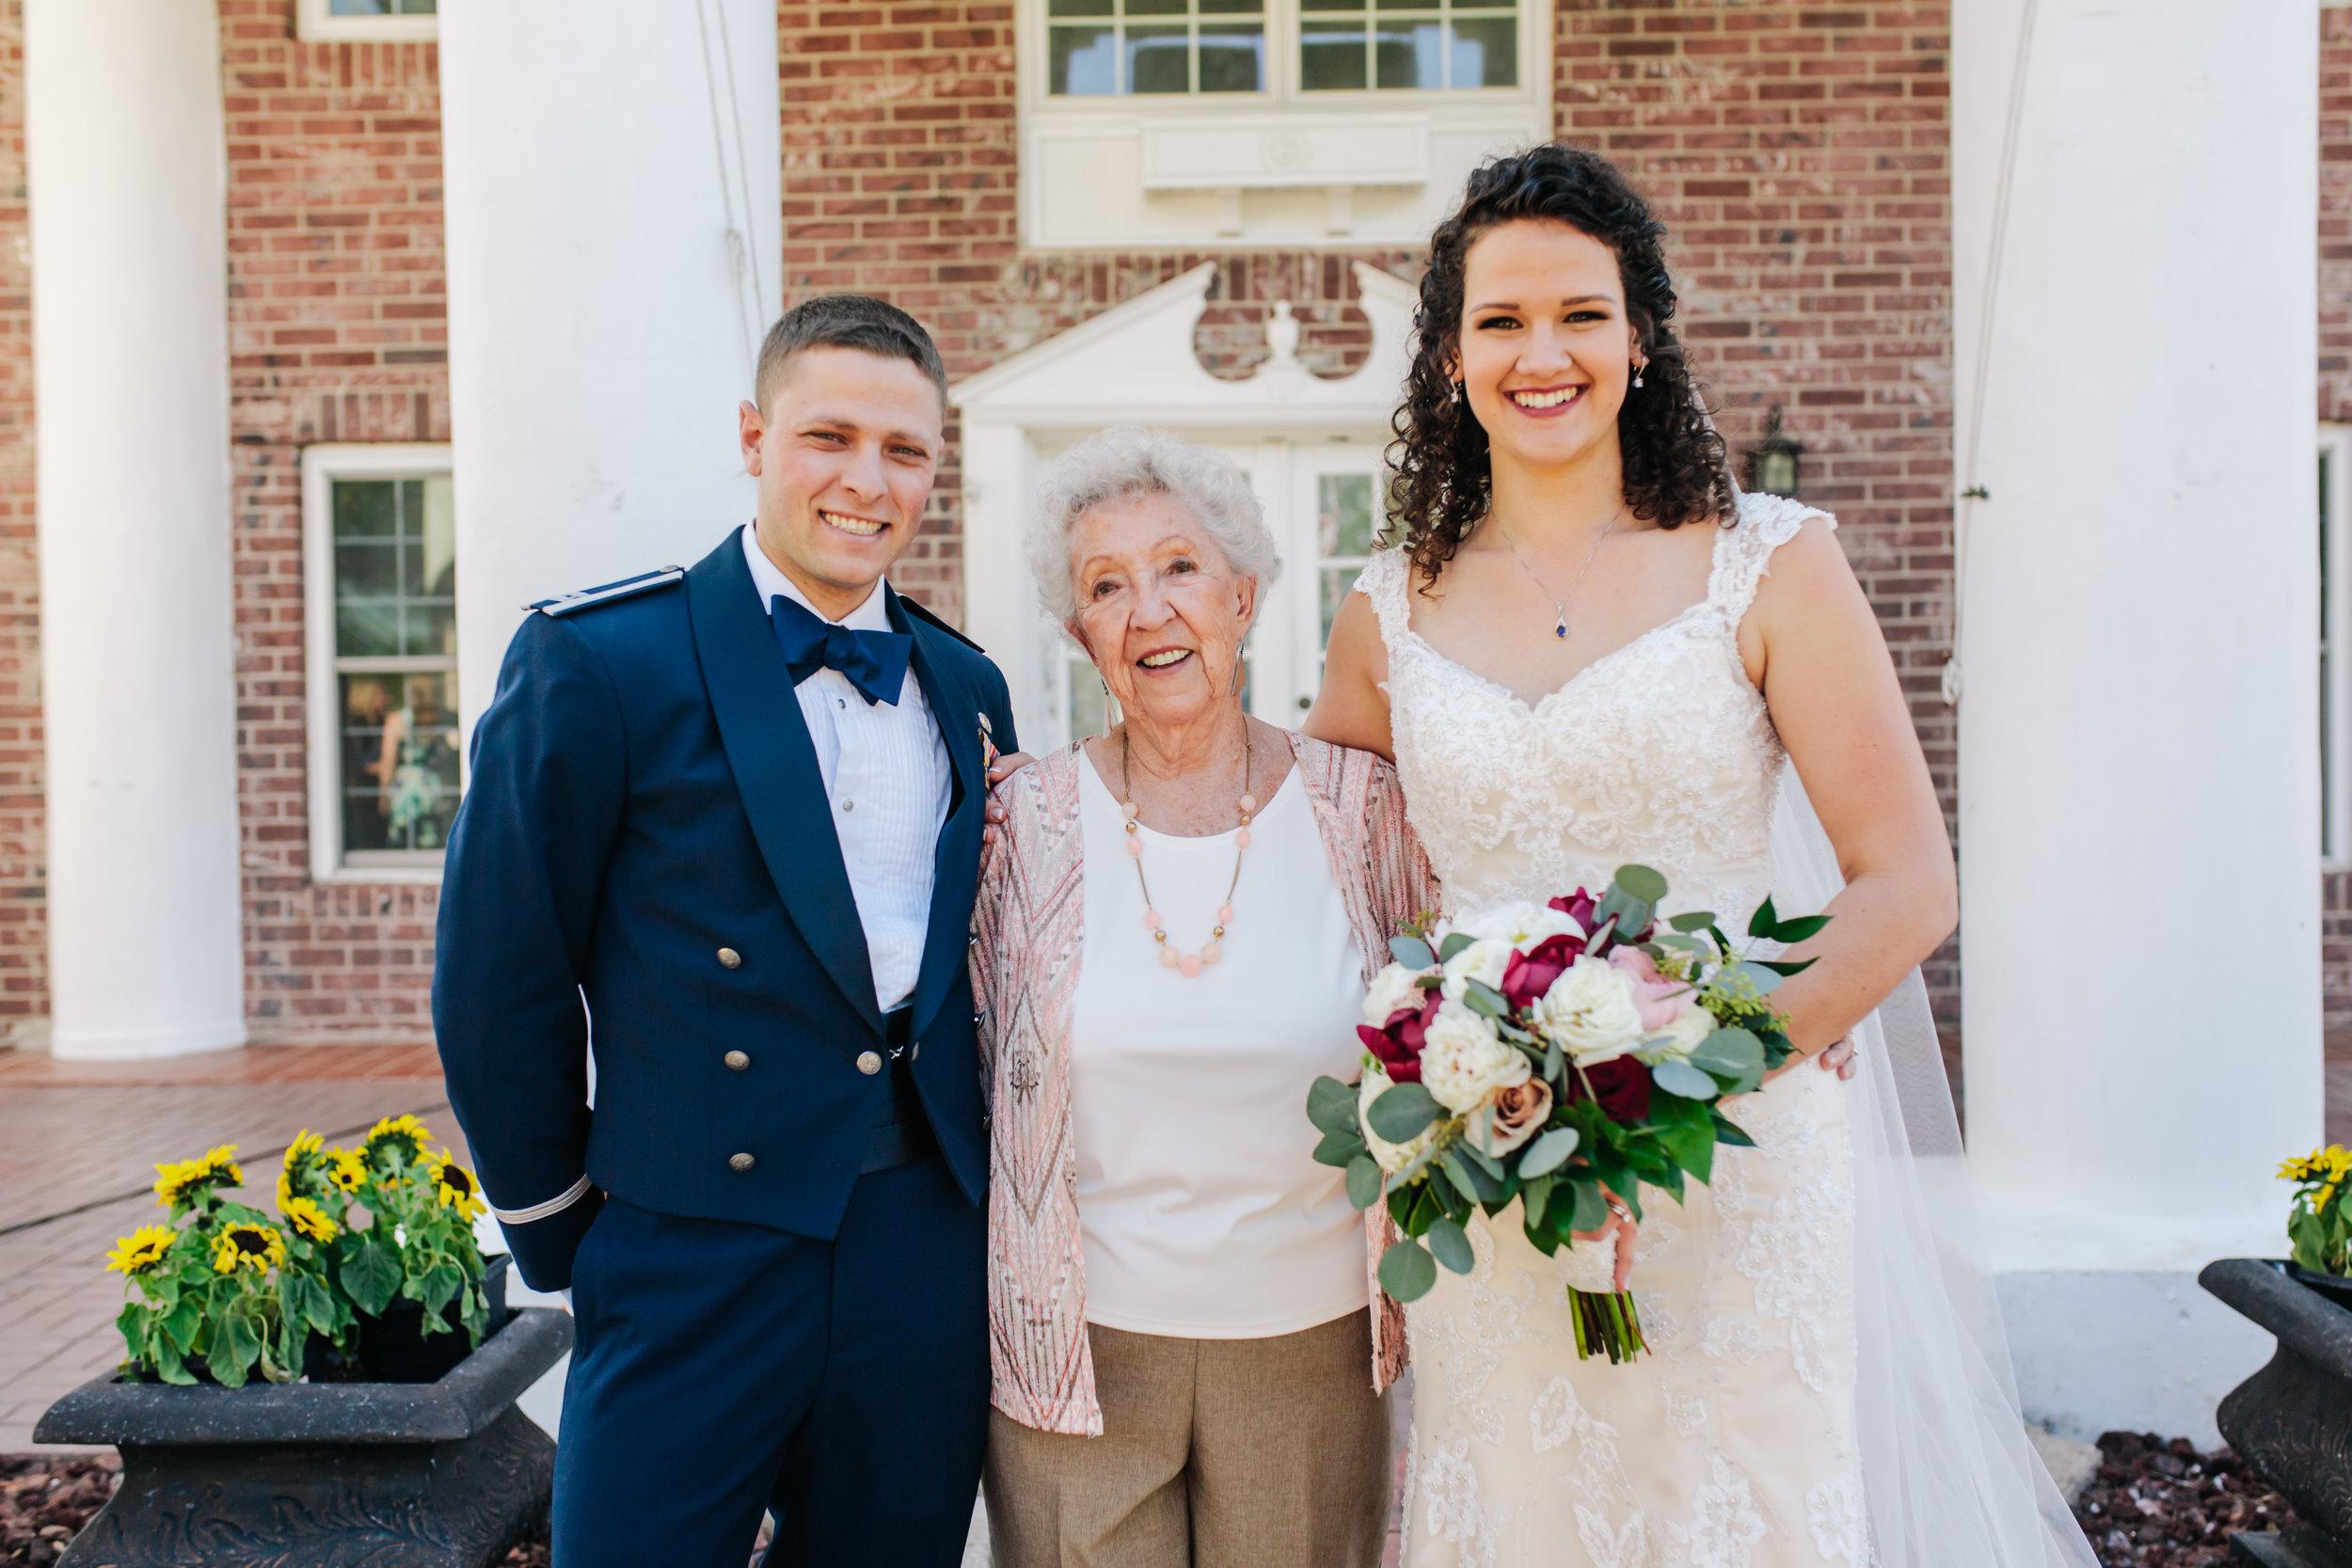 2018.03.17 Allison and Chuck Wedding Waelti Melbourne (422 of 569).jpg